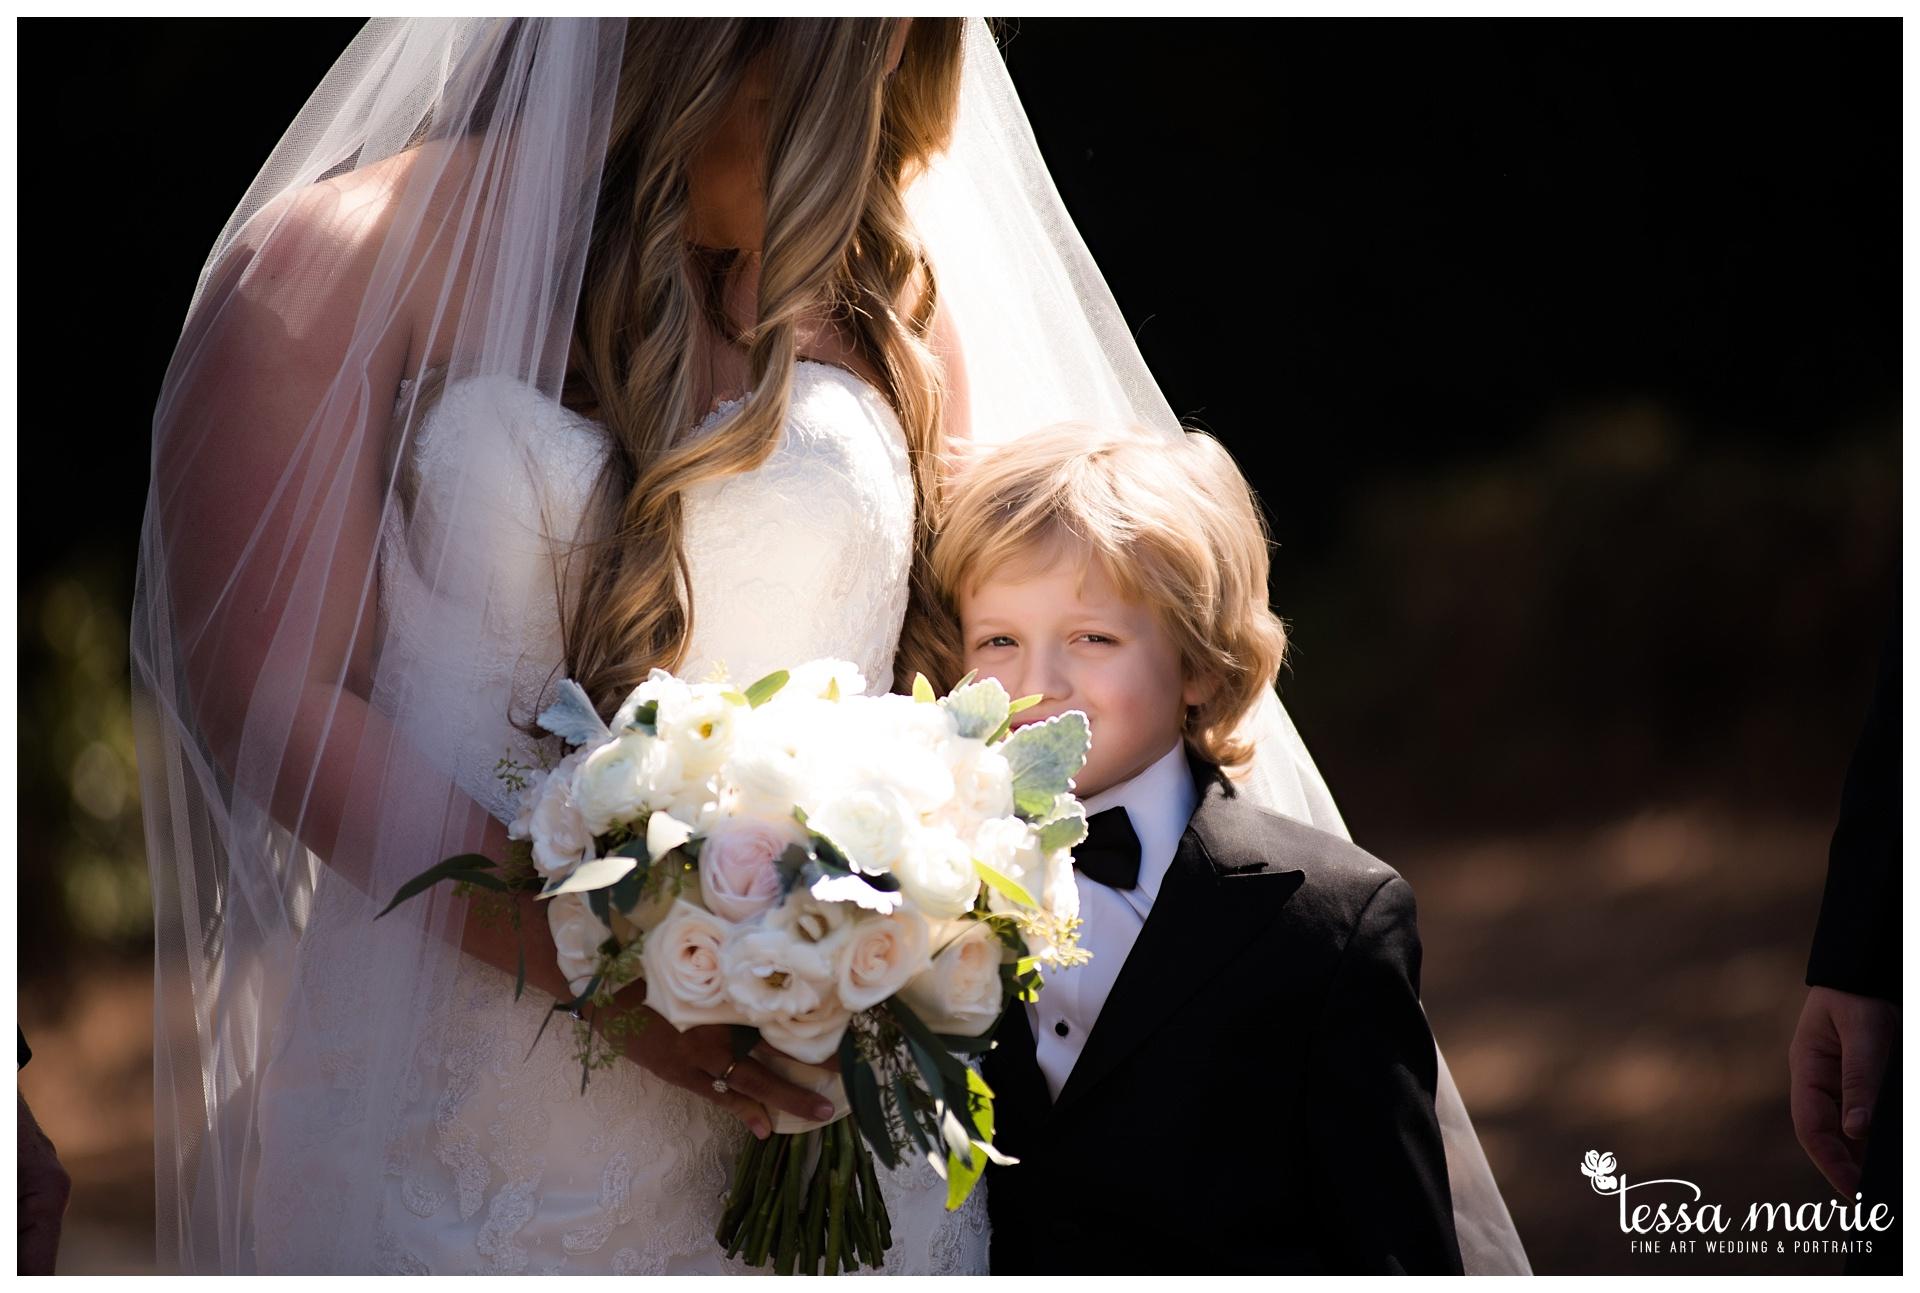 tessa_marie_weddings_legacy_story_focused_wedding_pictures_atlanta_wedding_photographer_0103